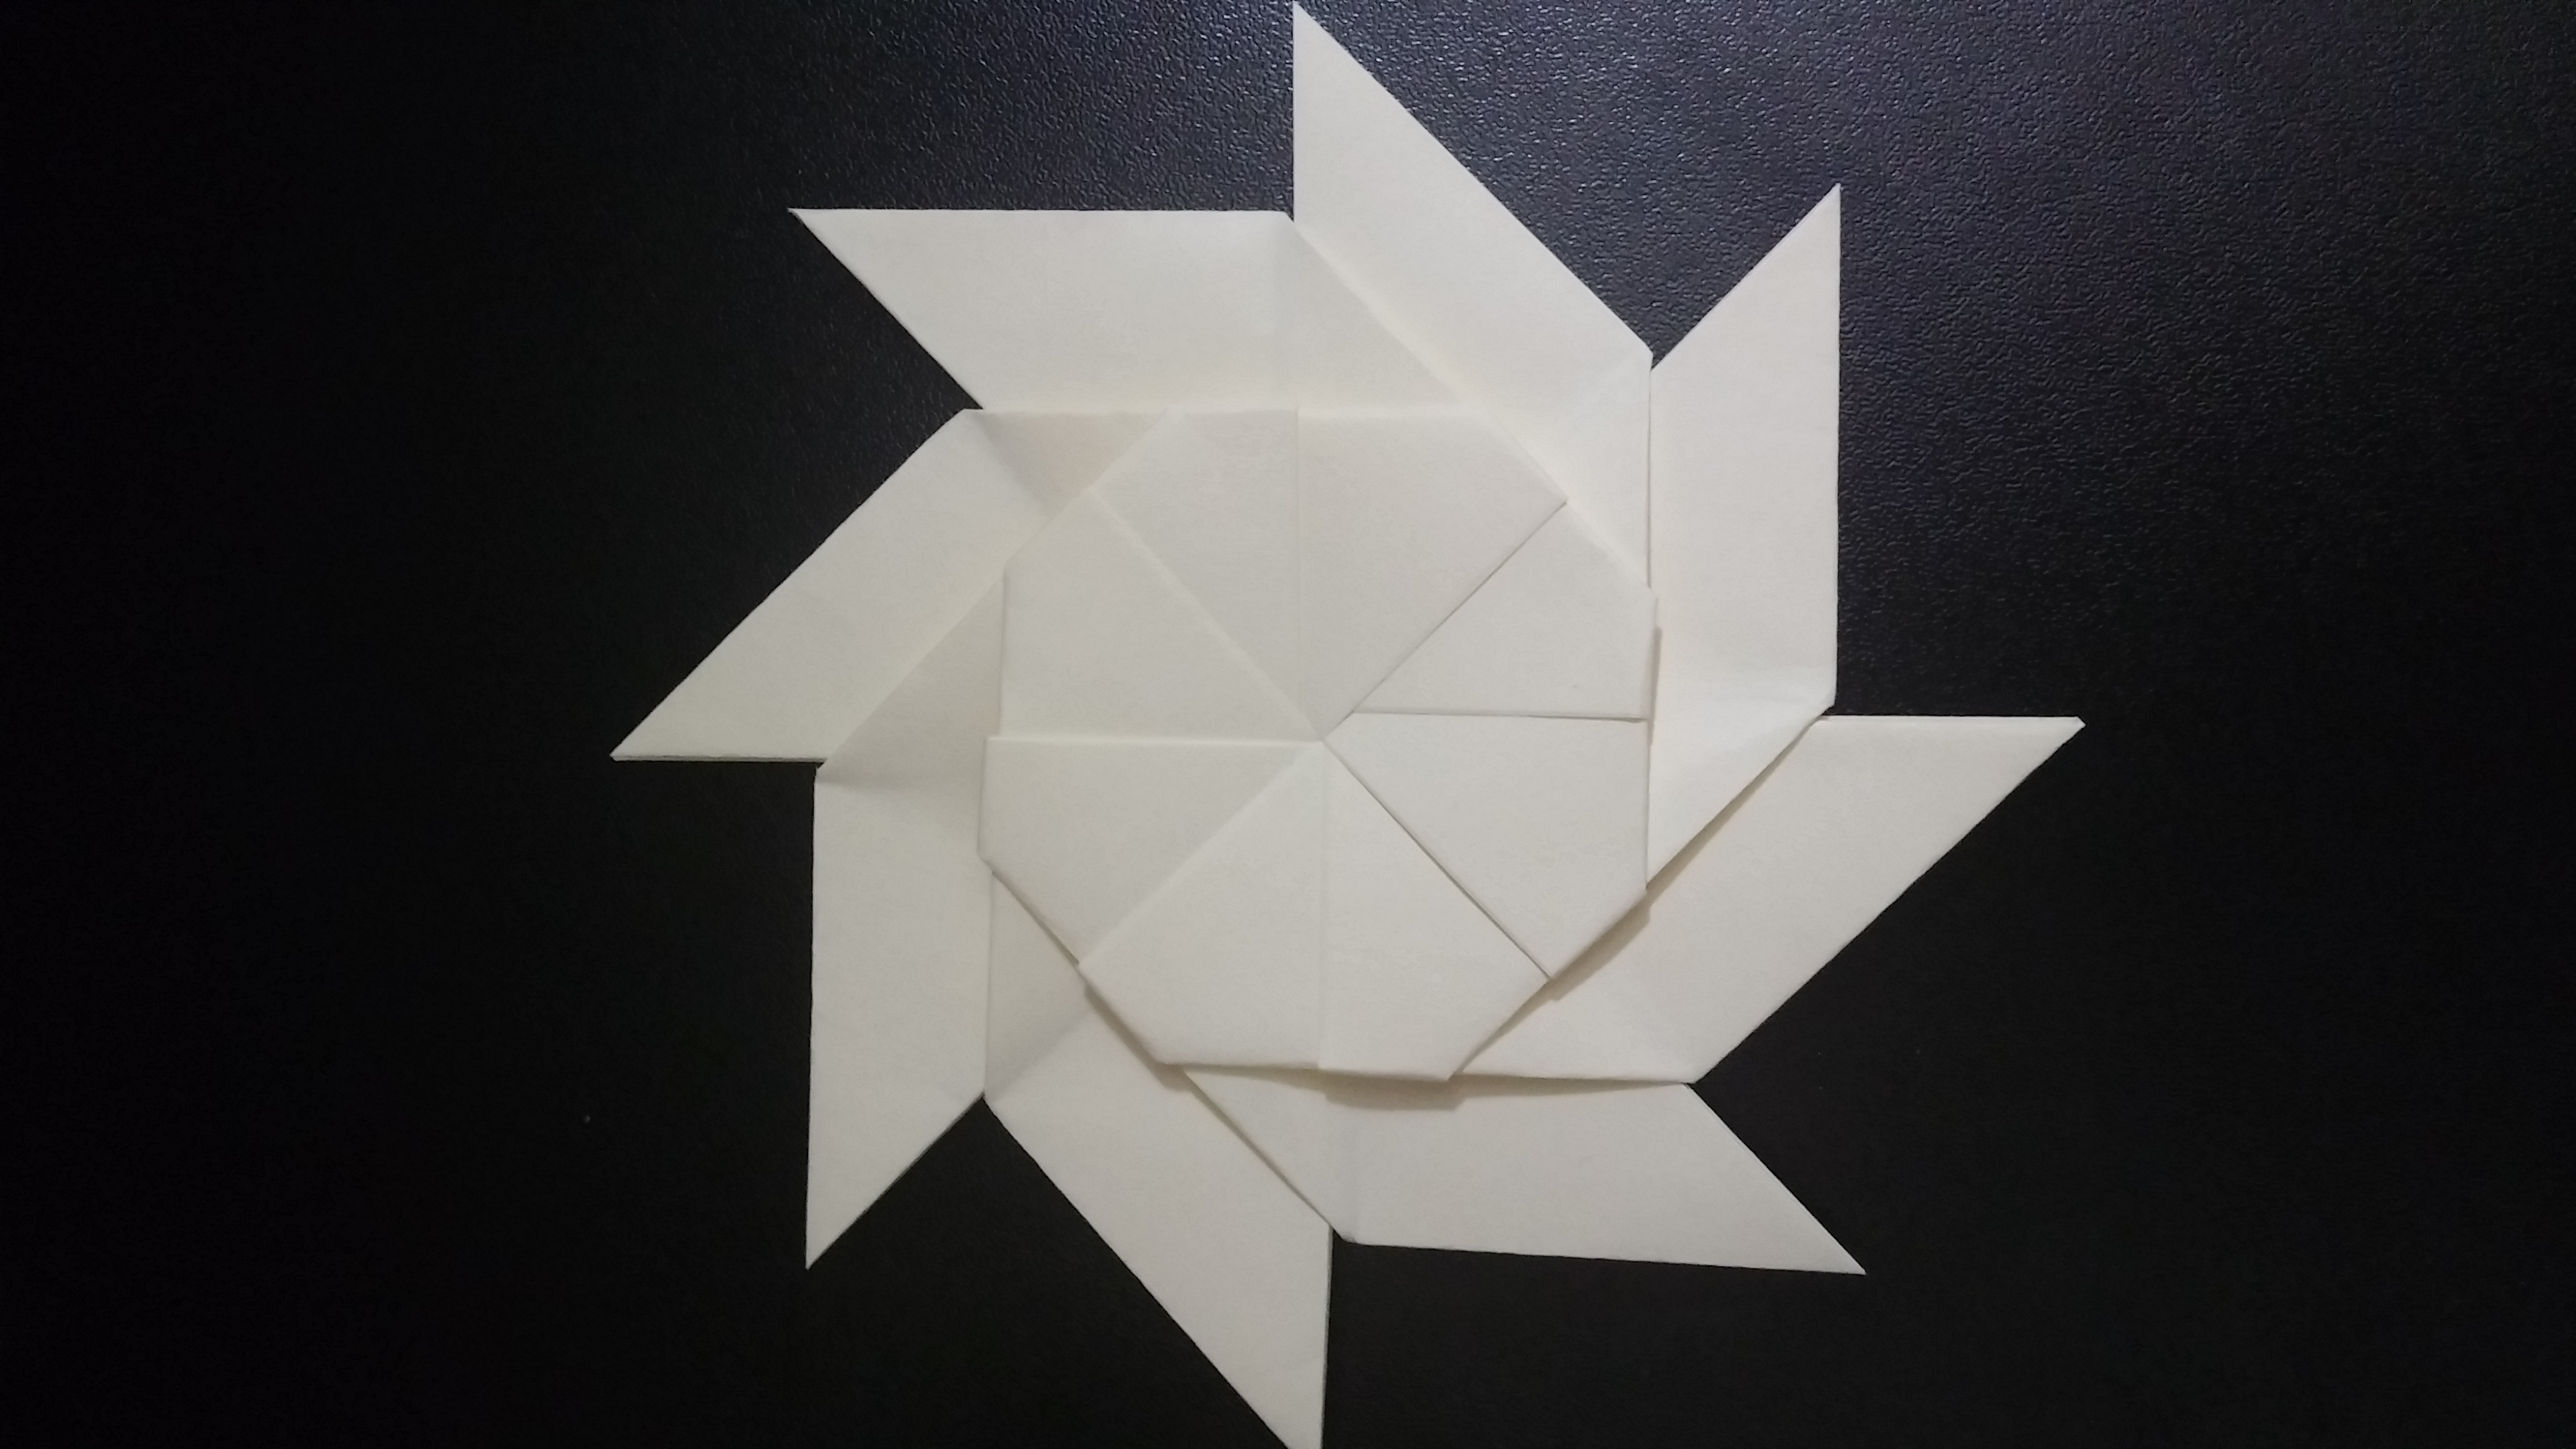 Picture of Modular Transforming Ninja Star